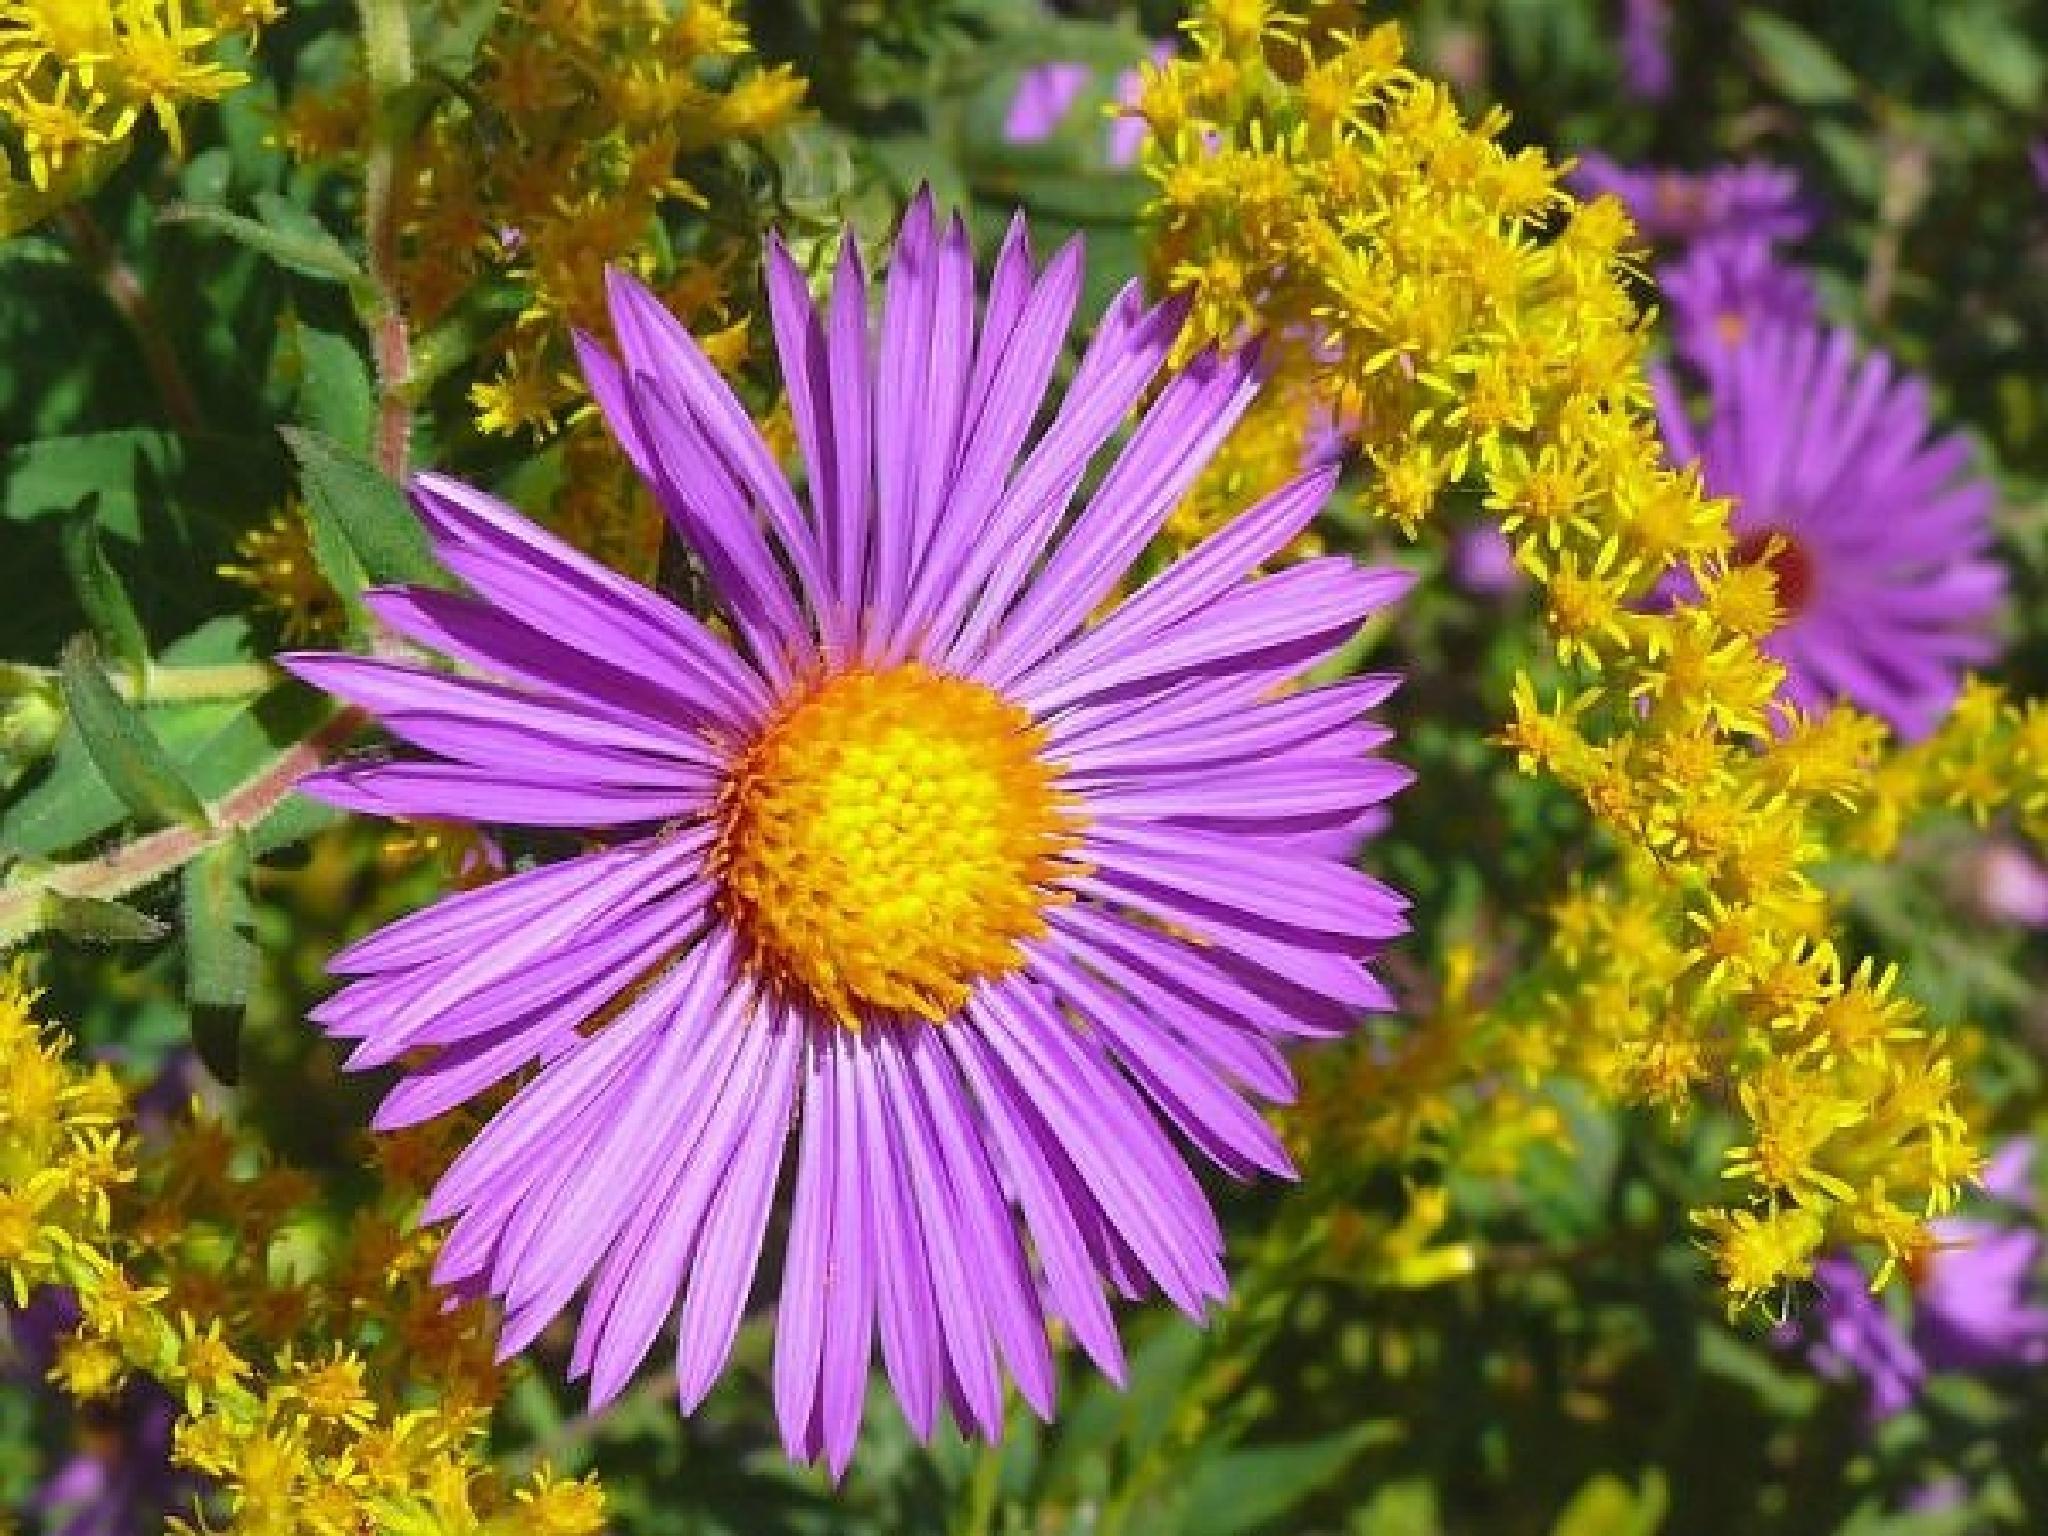 ~~~~. PURPLE FLOWERS..! by gajju.tyagi.1